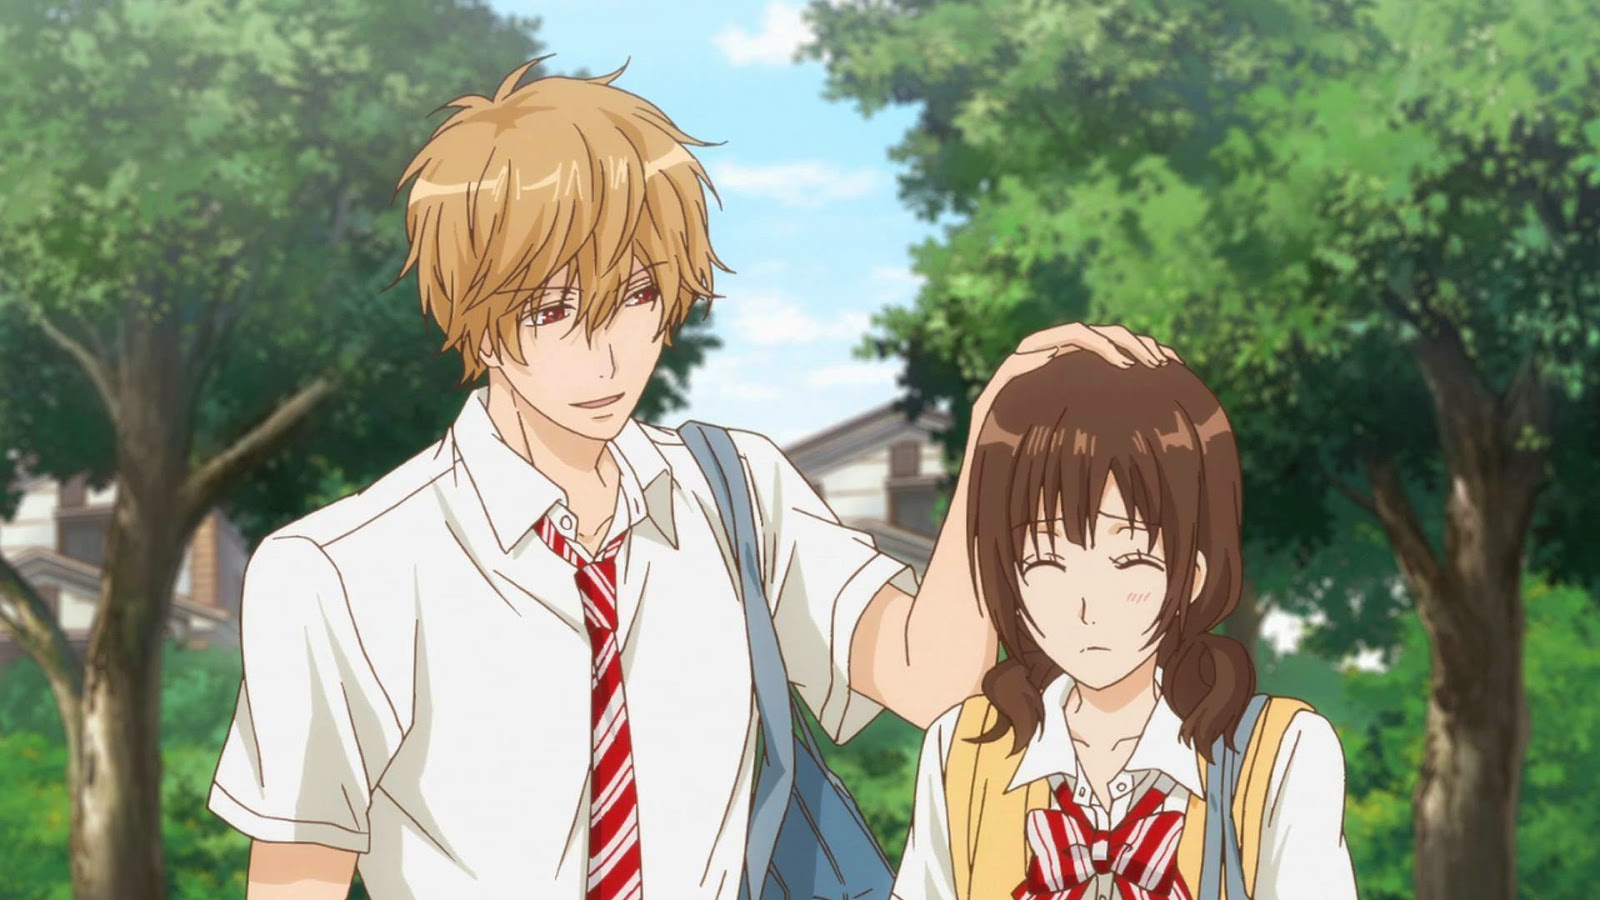 Anime Ini Menceritakan Tentang Khidupan Sekolah Dimana Sang Cewe Bernama Erika Pertama Kali Masuk Ke Sebuah Sekolahdisana Ia Ingin Mendapatkan Teman Namun